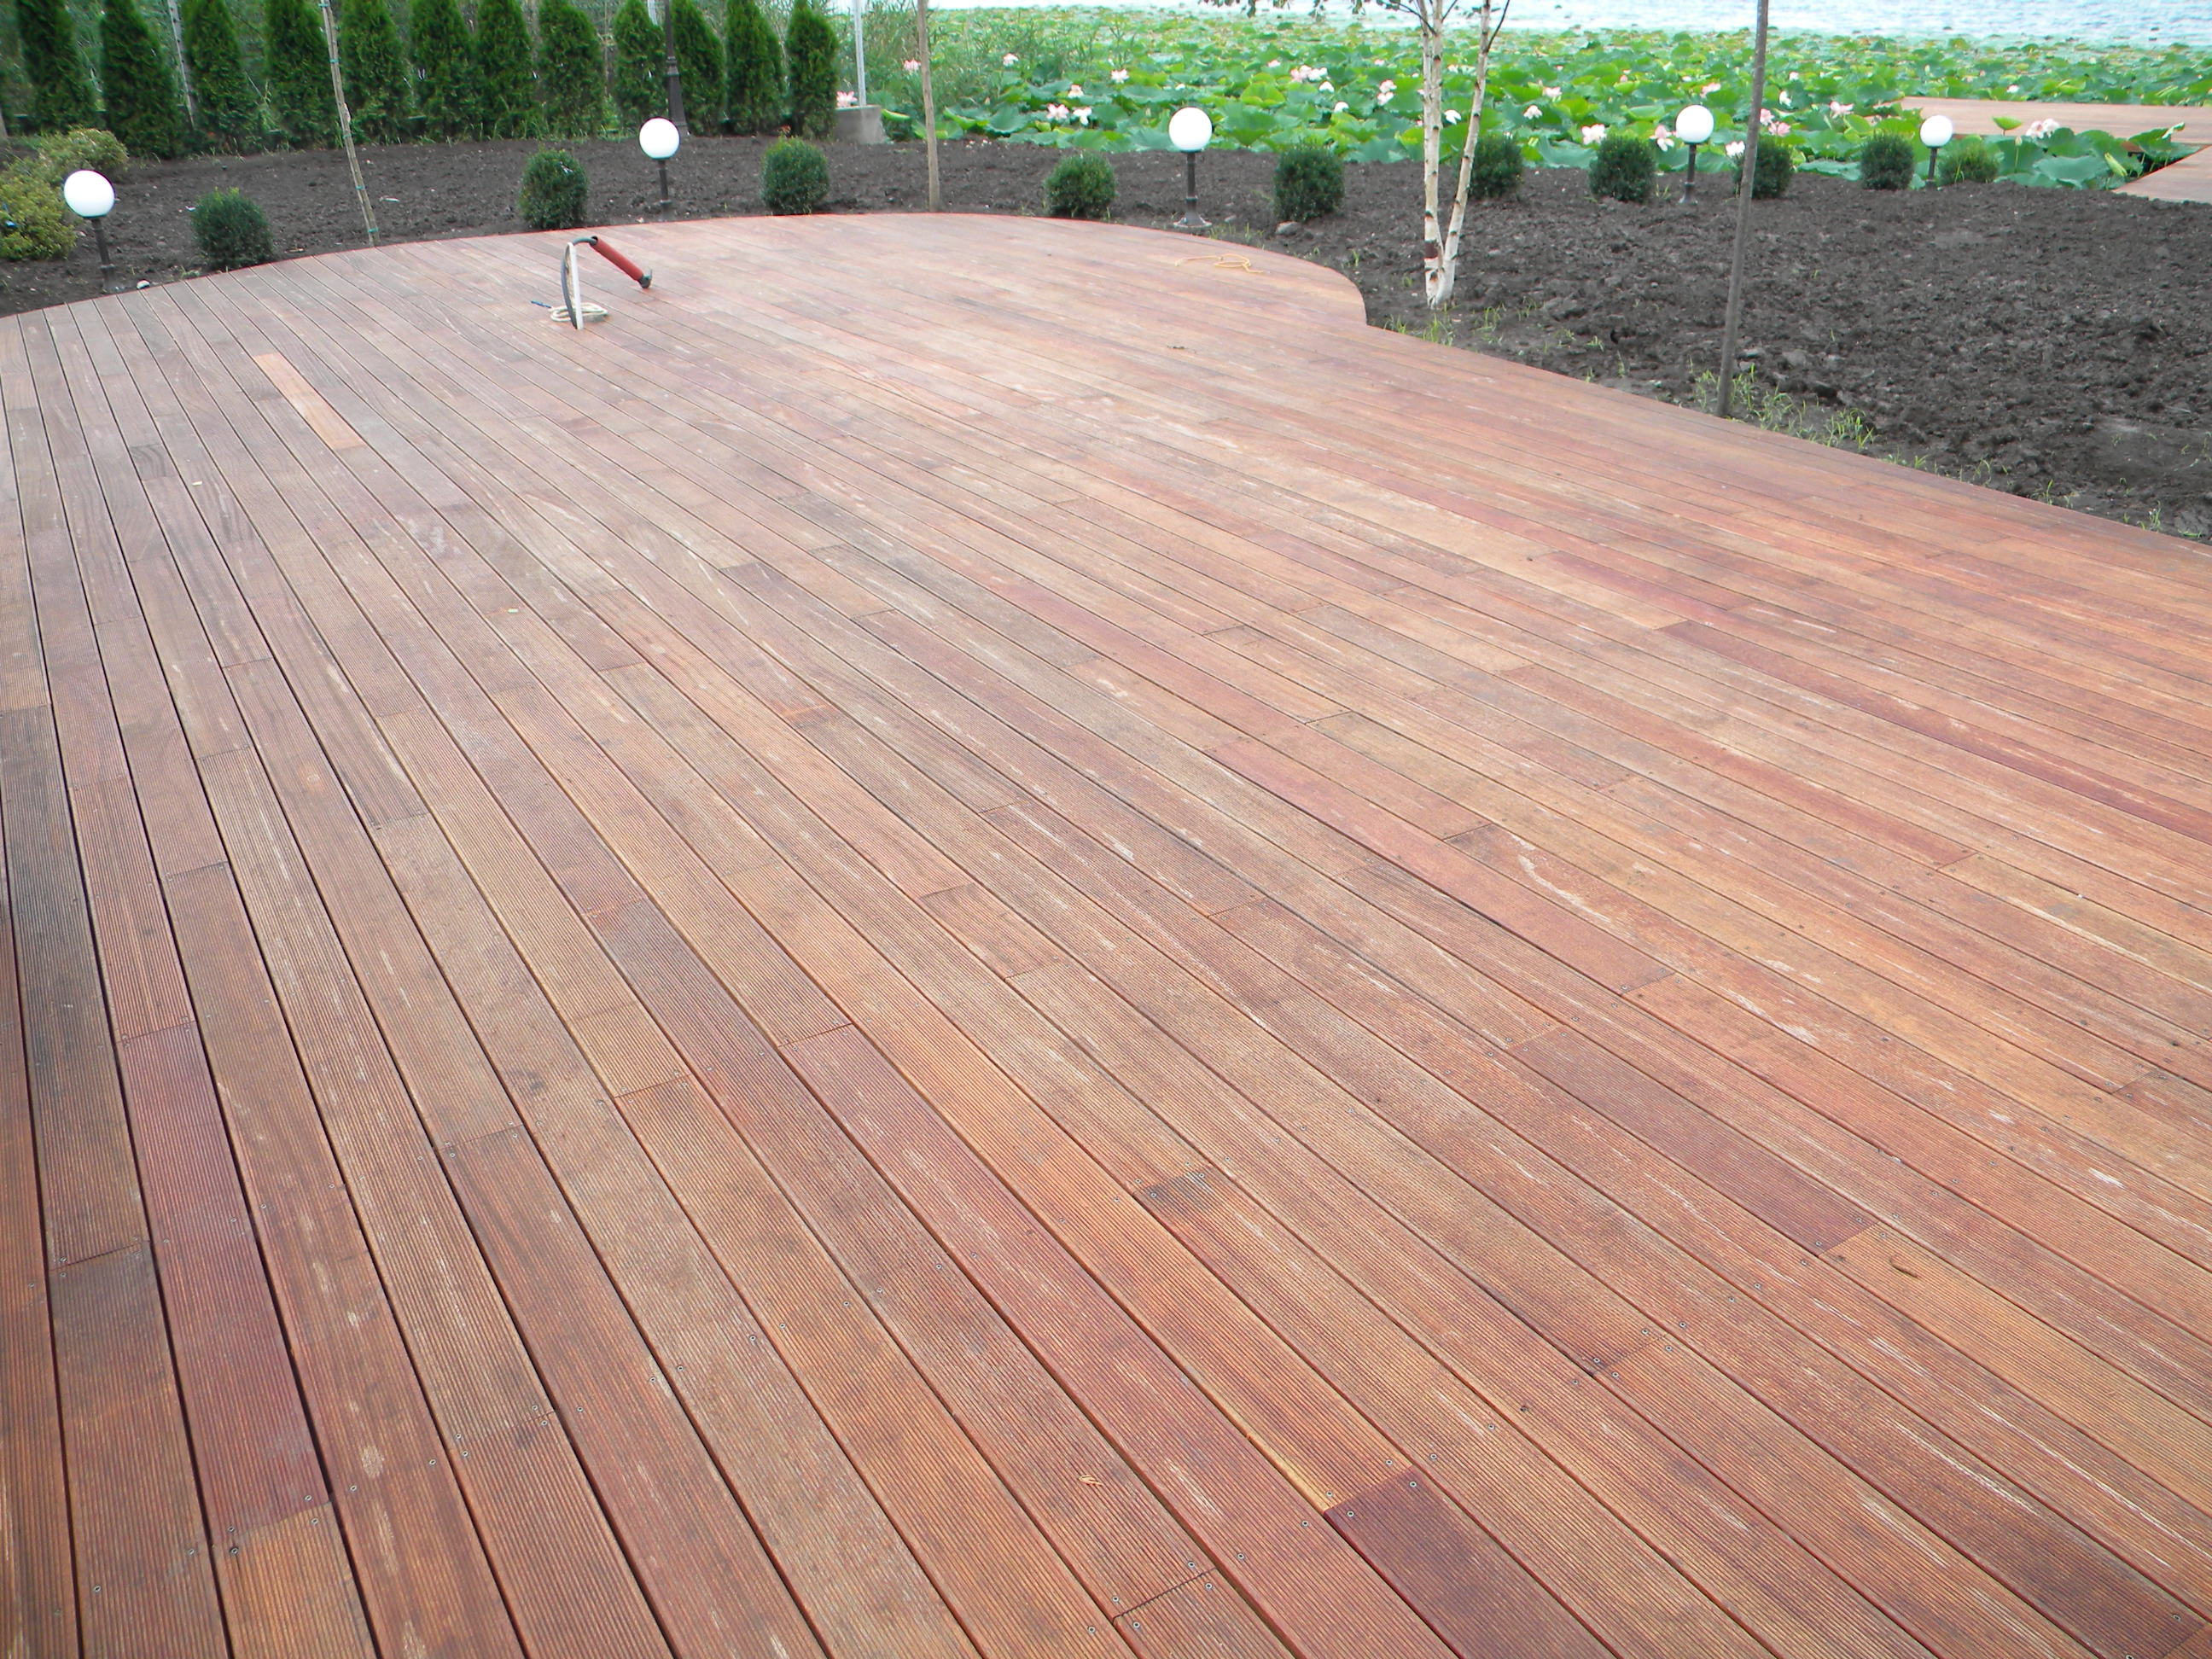 Deck-uri lemn - Angelim Pedra SELVA FLOORS - Poza 44